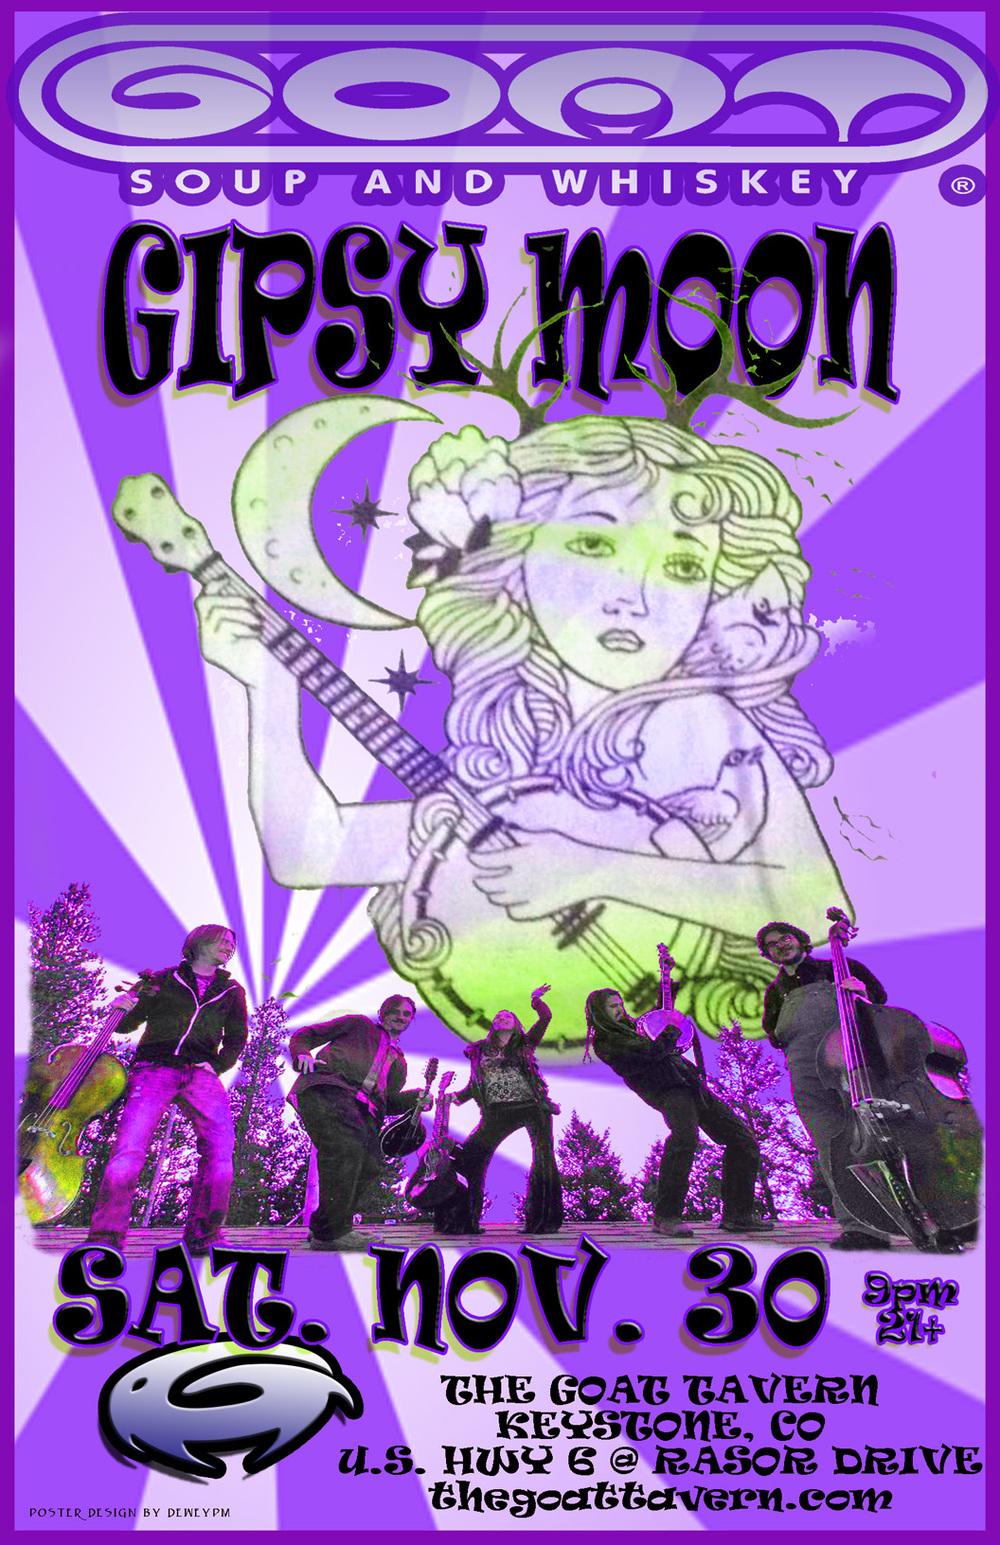 GIPSY-MOON-2013-F-WEB.jpg